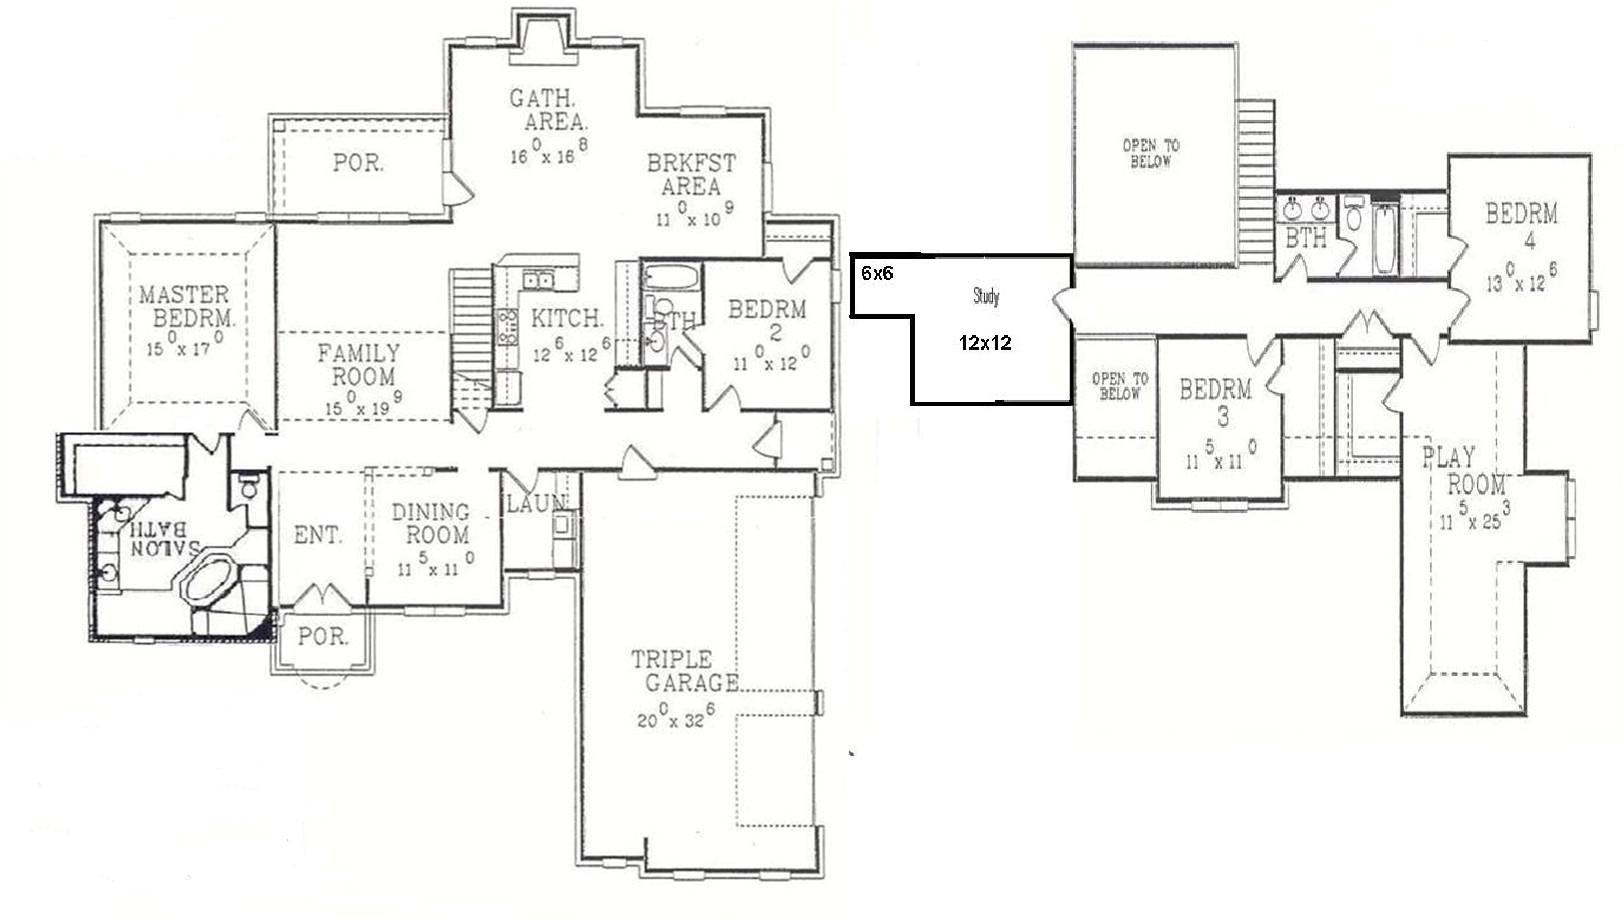 Oakwood Mobile Home Floor Plans 2000 Oakwood Mobile Home Floor Plan Modern Modular Home